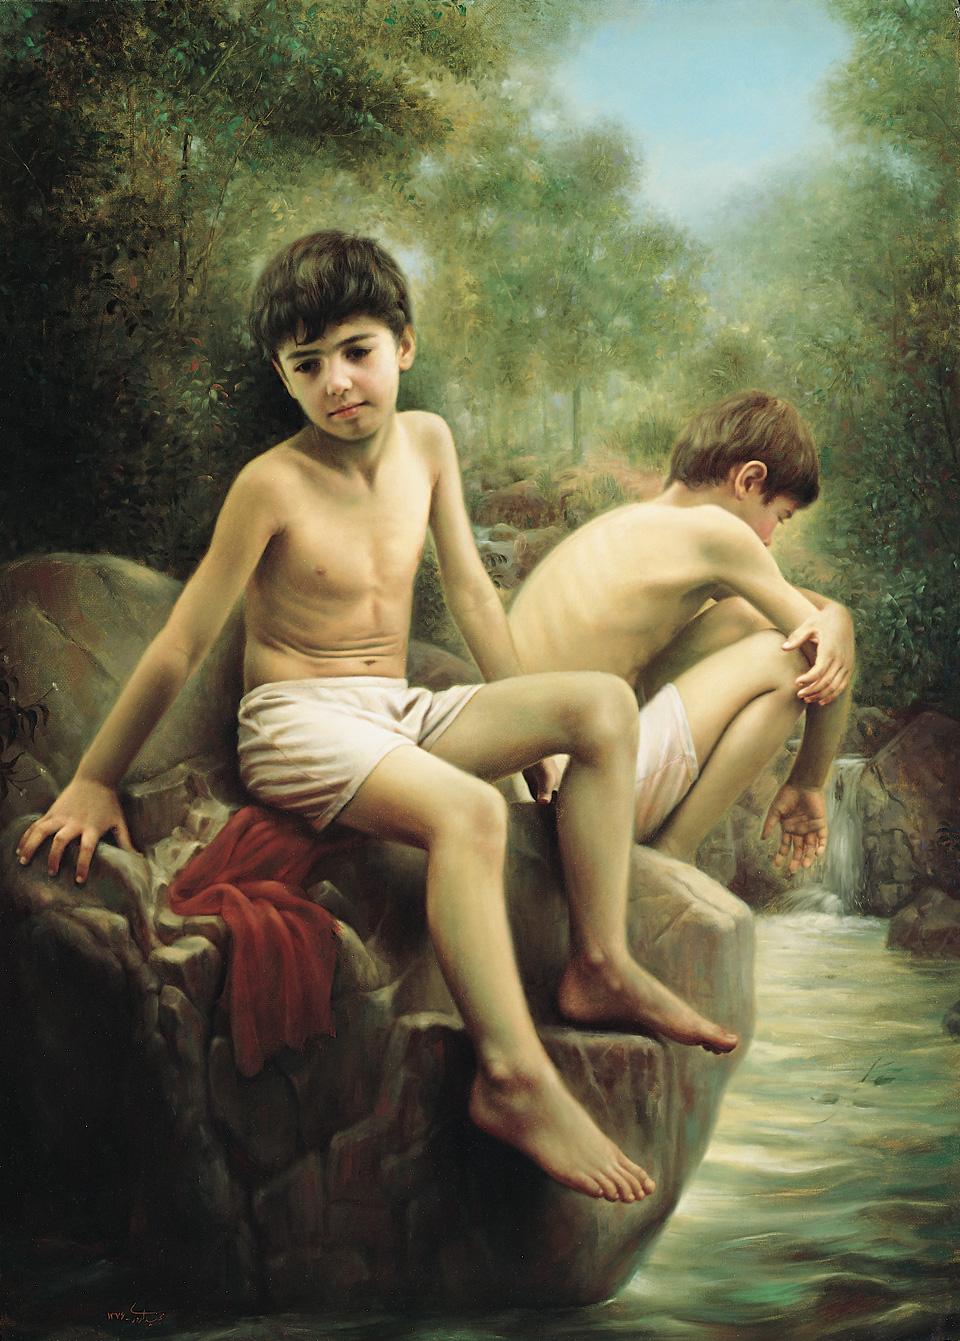 intsest-naturizm